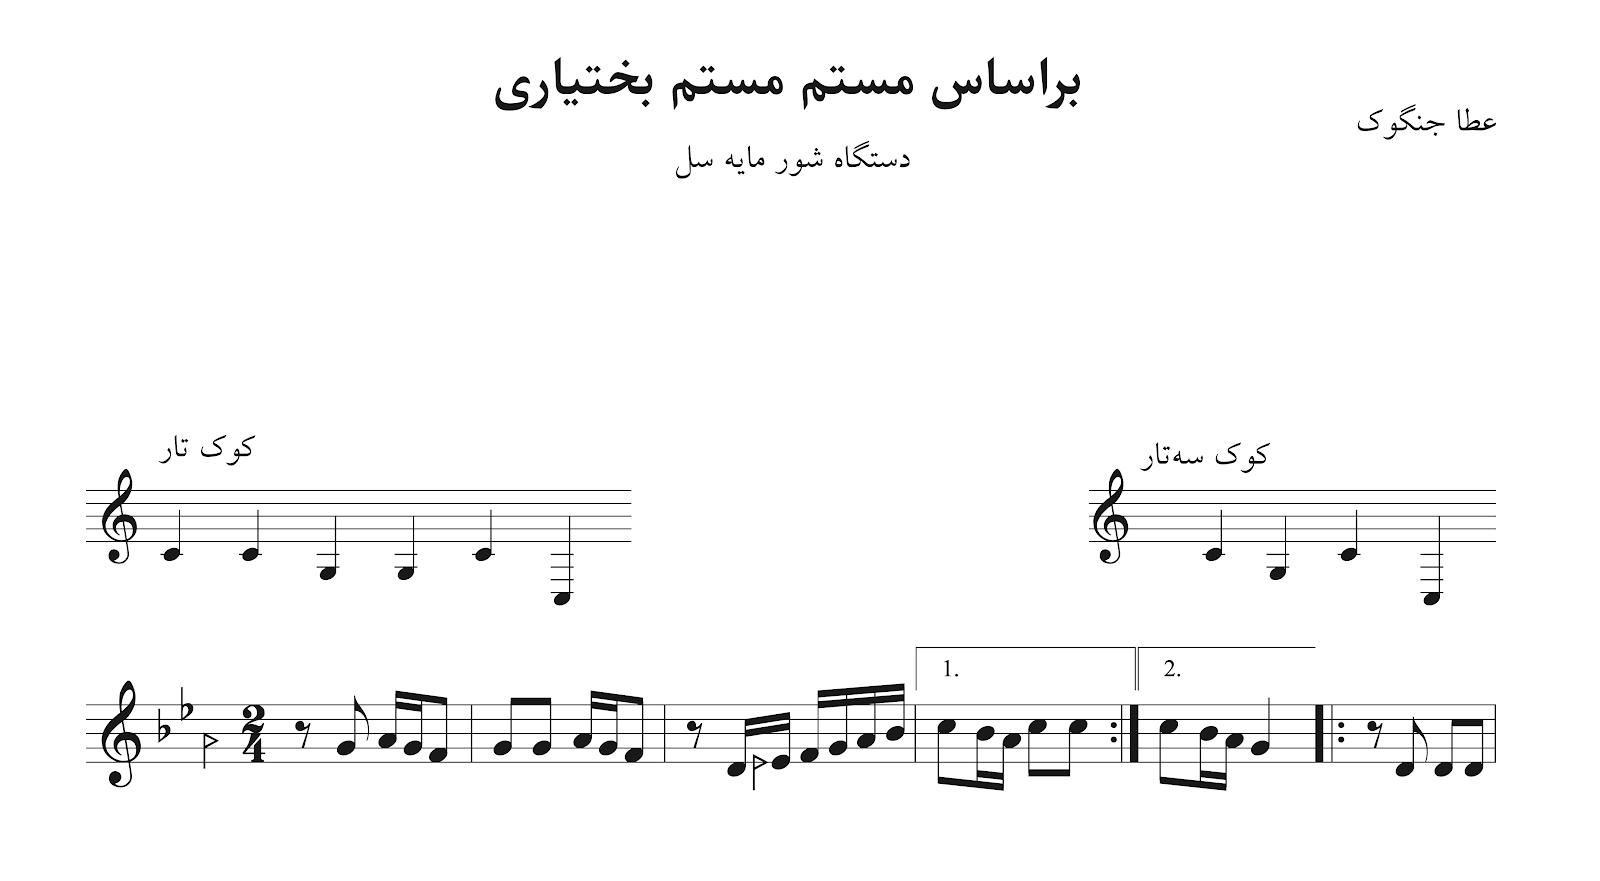 نت آهنگی براساس مستم مستم بختیاری عطا جنگوک